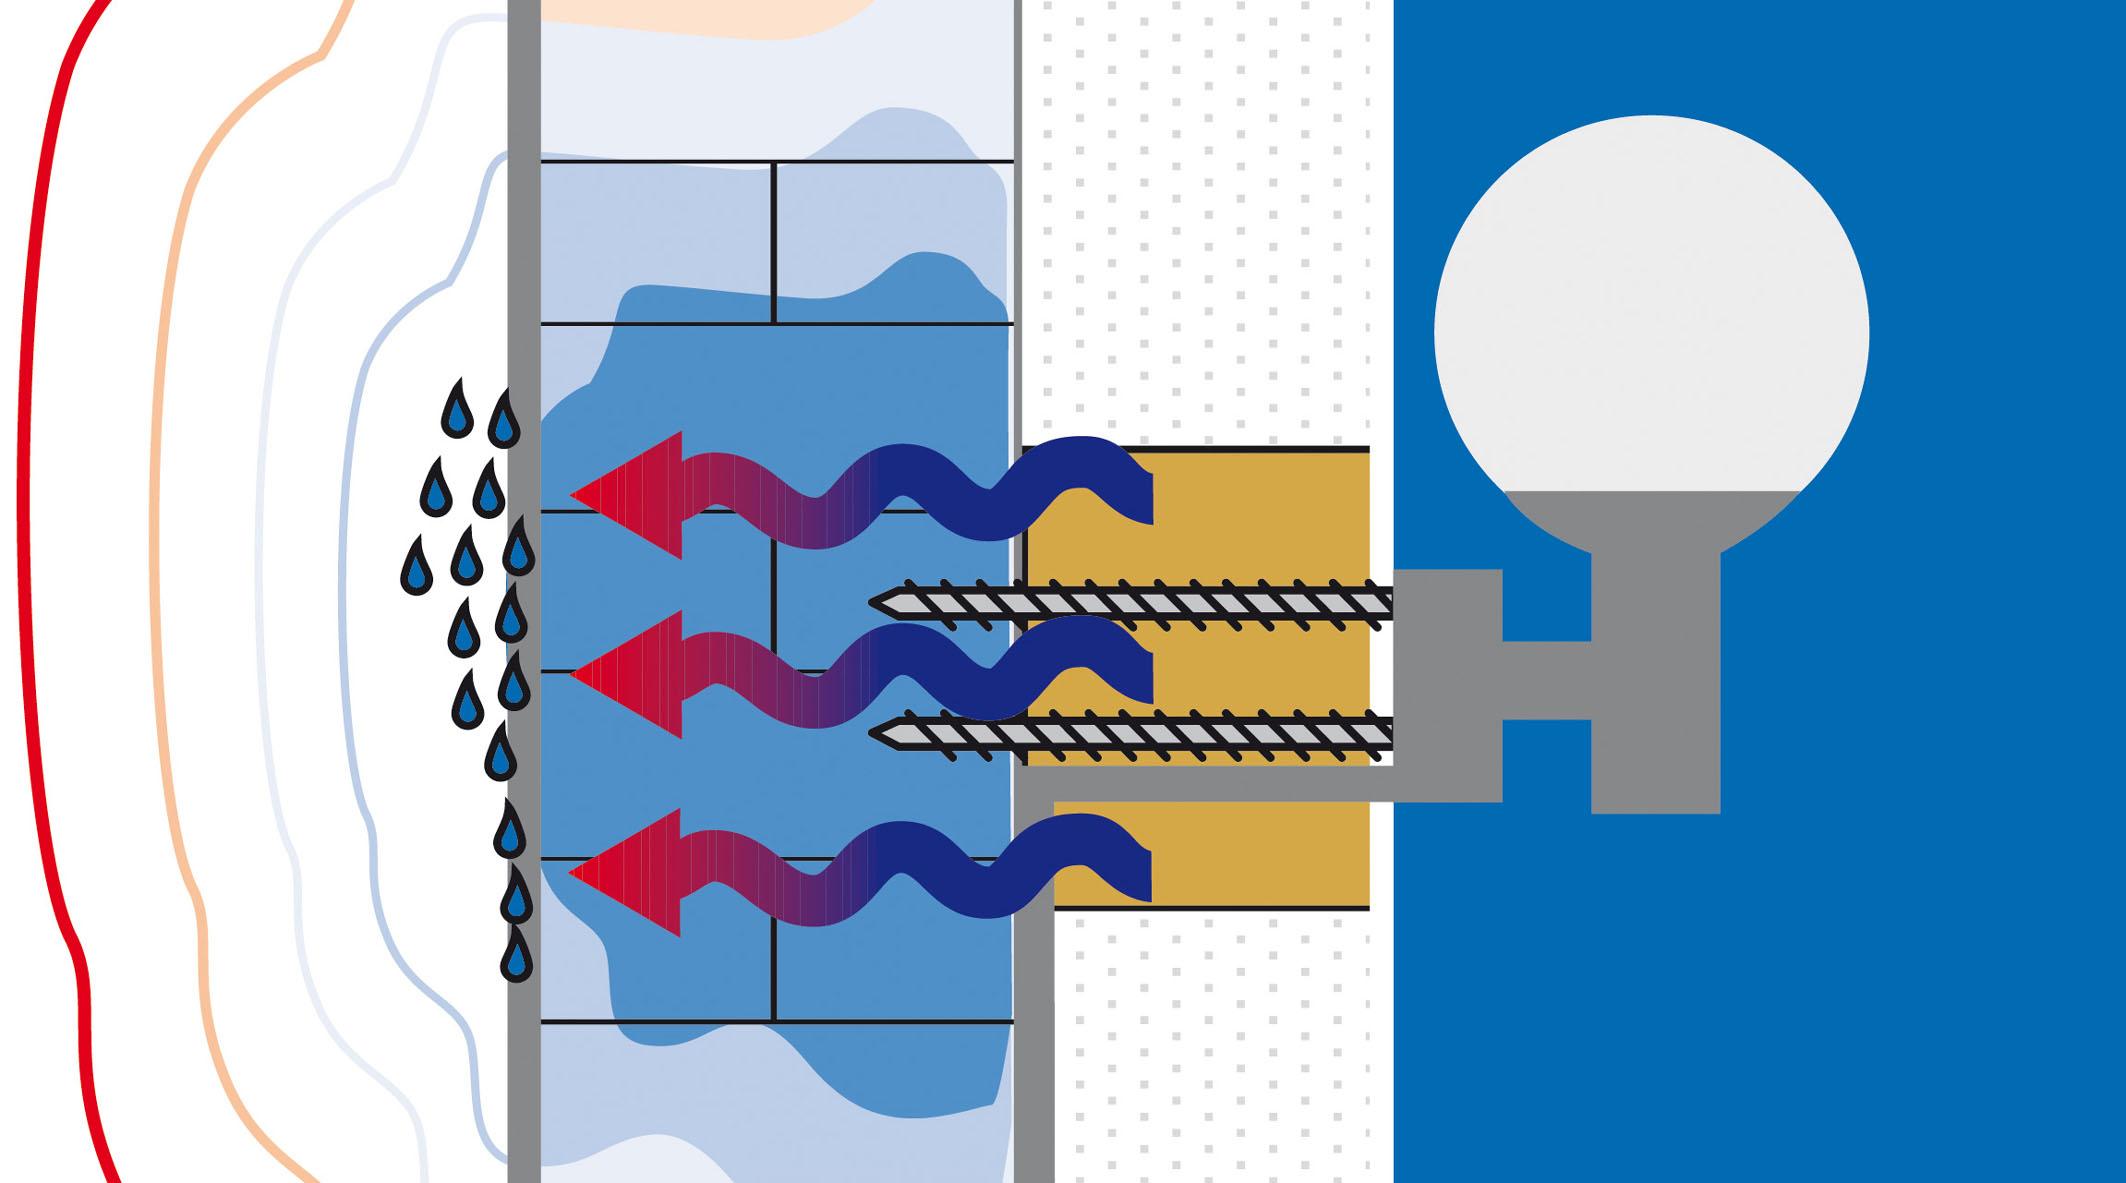 Wie man Wärmeverluste an Steckdosen vermeidet |